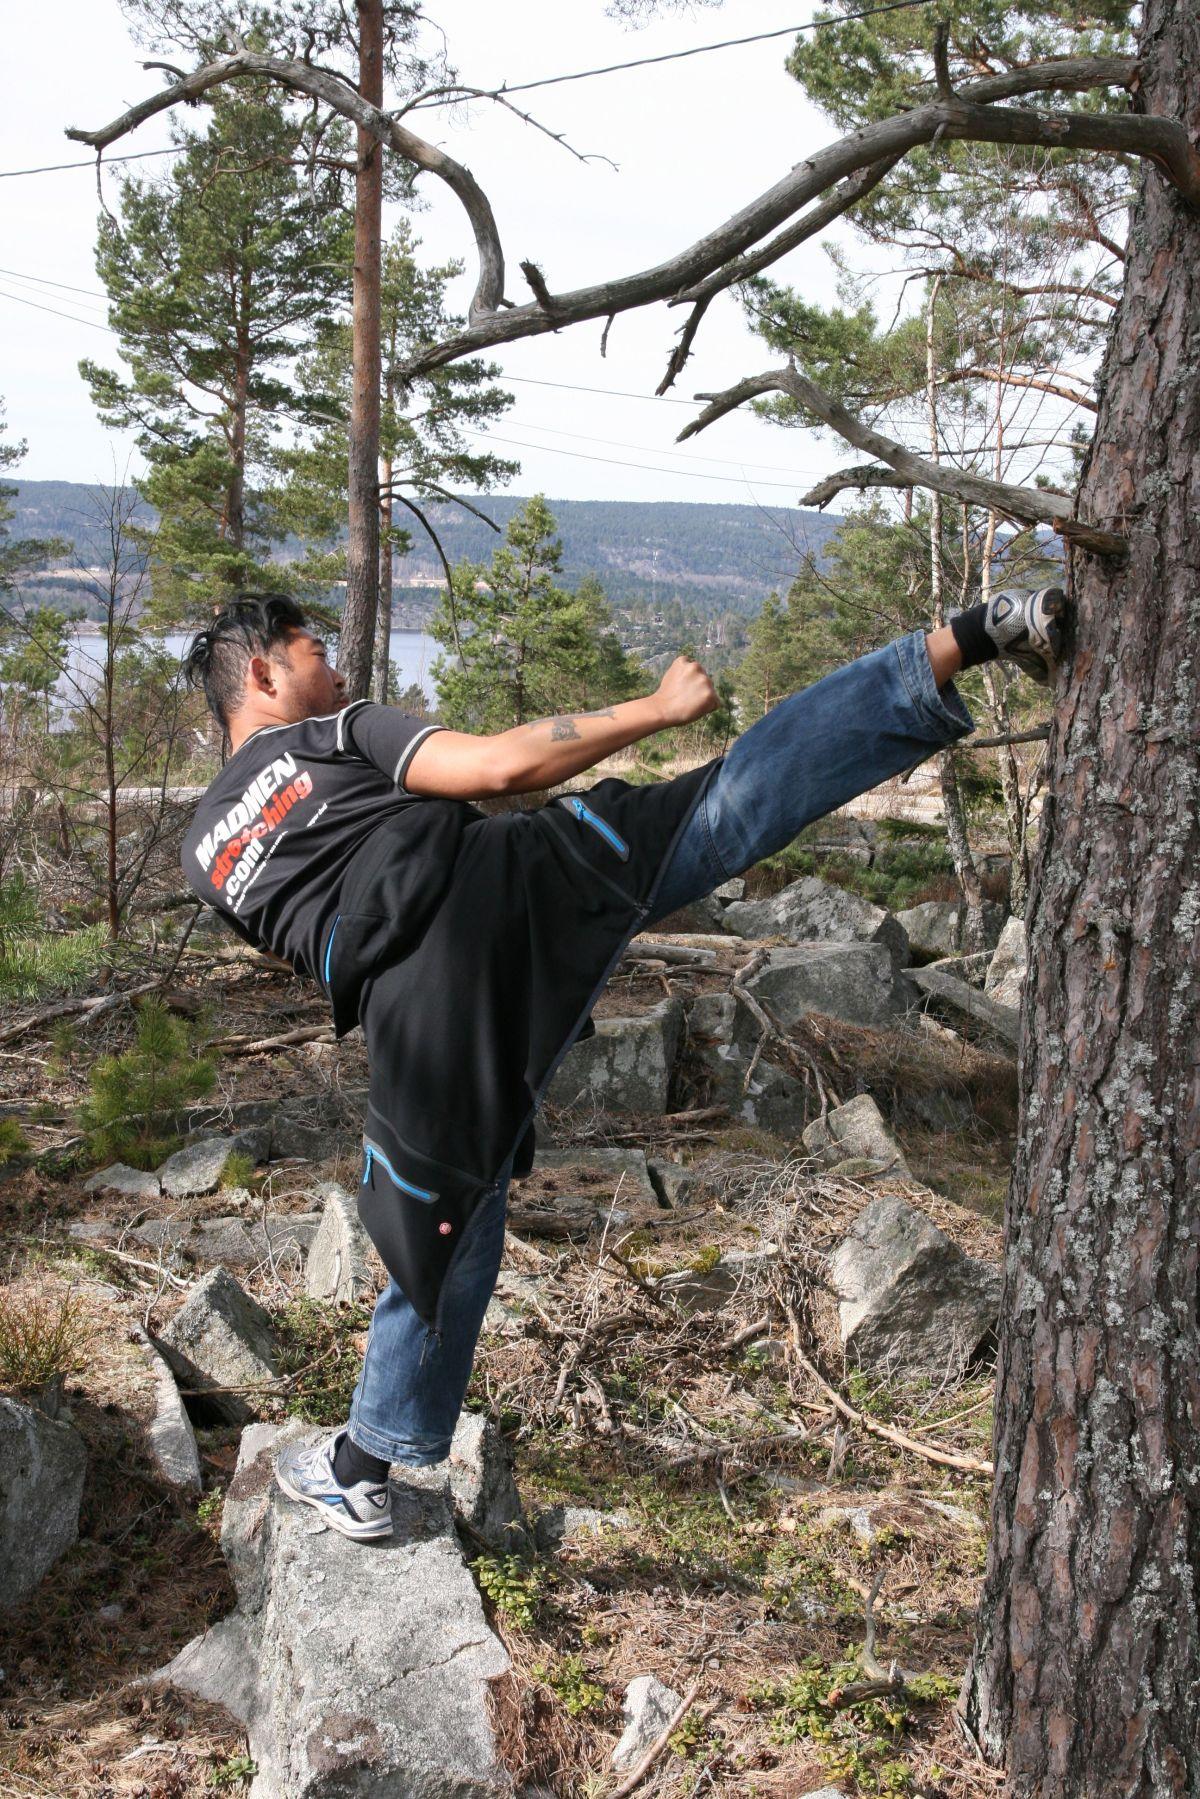 Stretching og trefelling – perfektkombo!